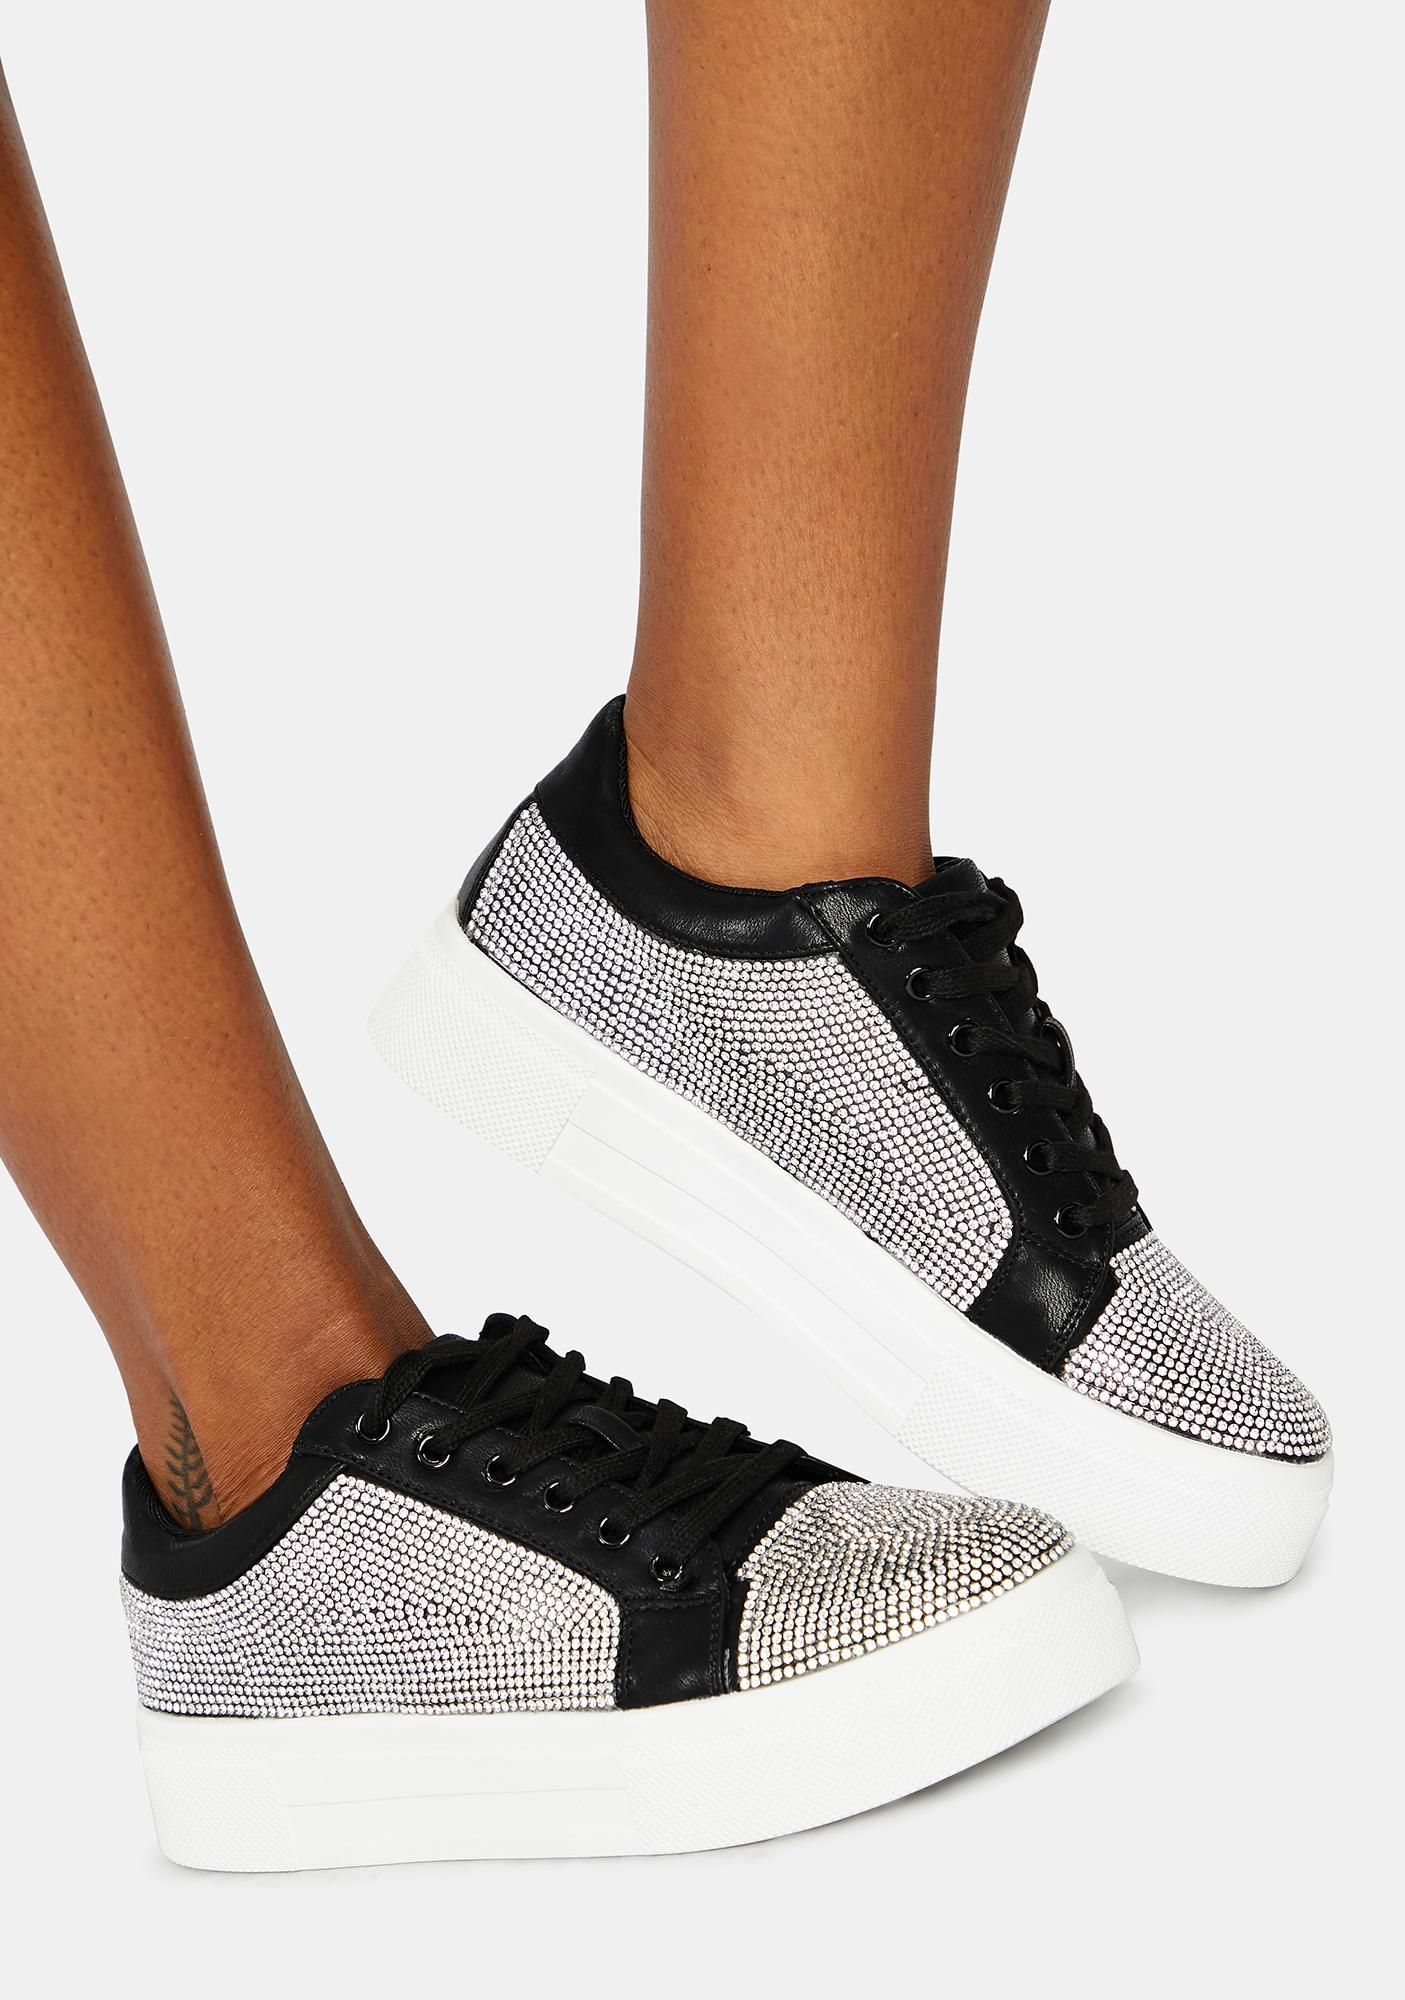 Noir Preppy Polished Rhinestone Sneakers